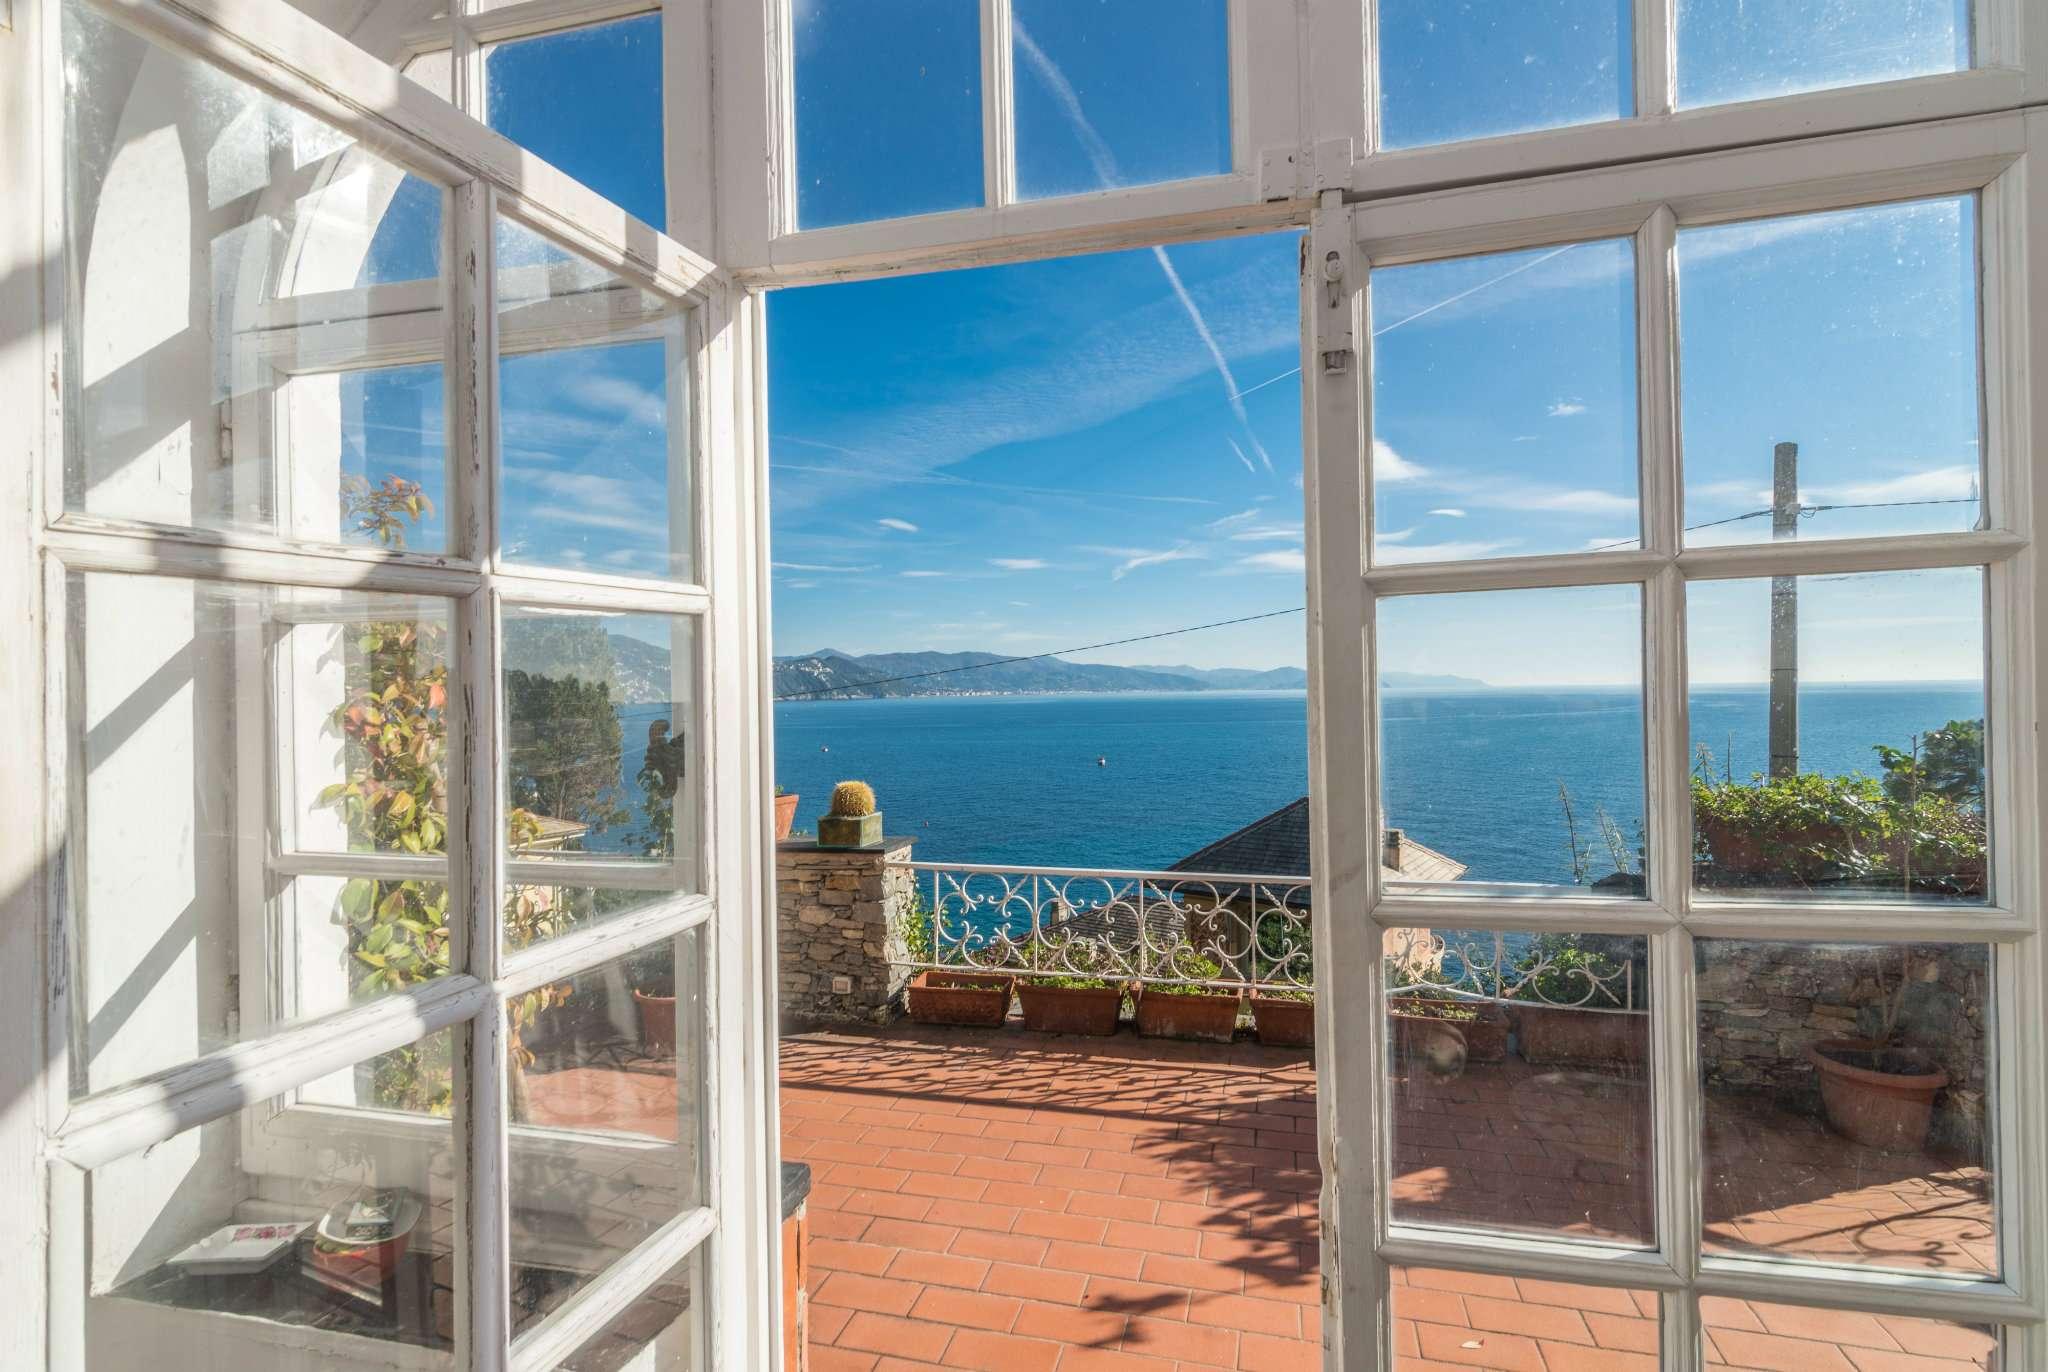 Villa in Vendita a Santa Margherita Ligure: 5 locali, 545 mq - Foto 16